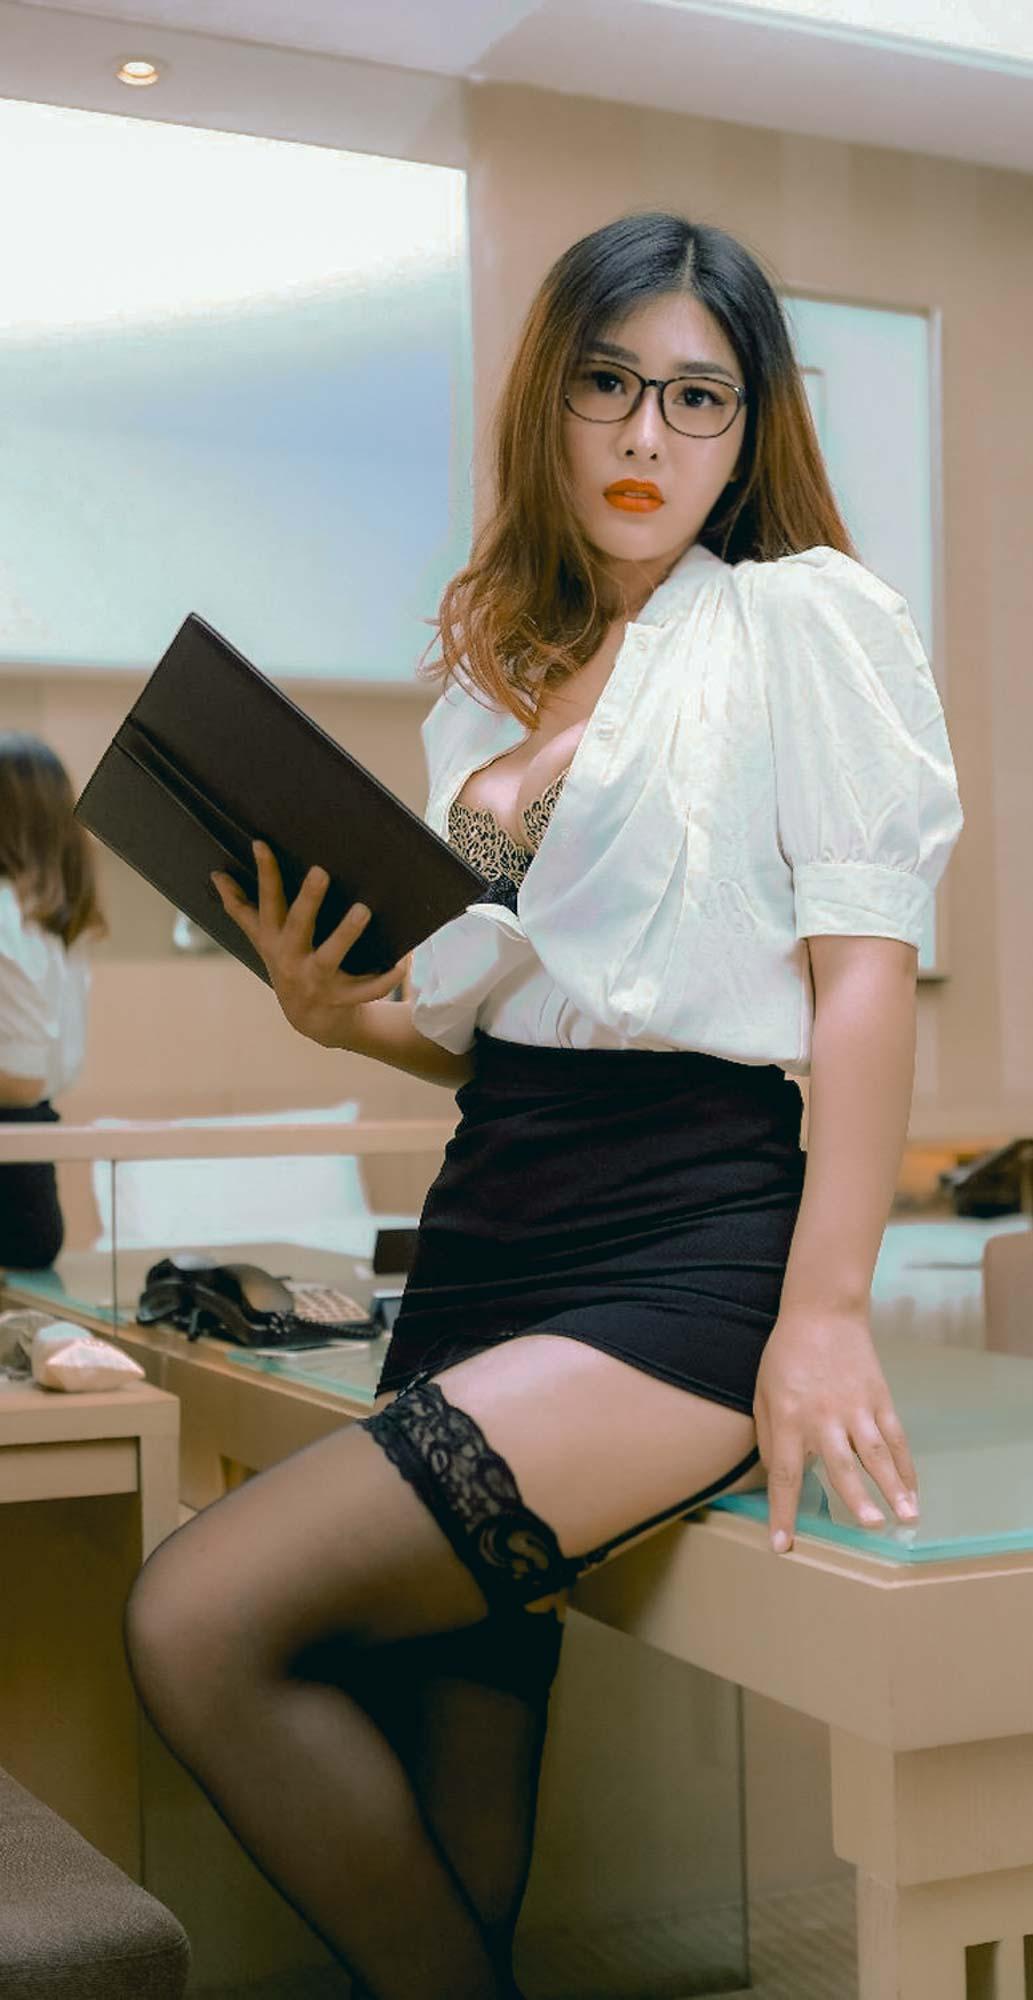 sexy korean secretary photo